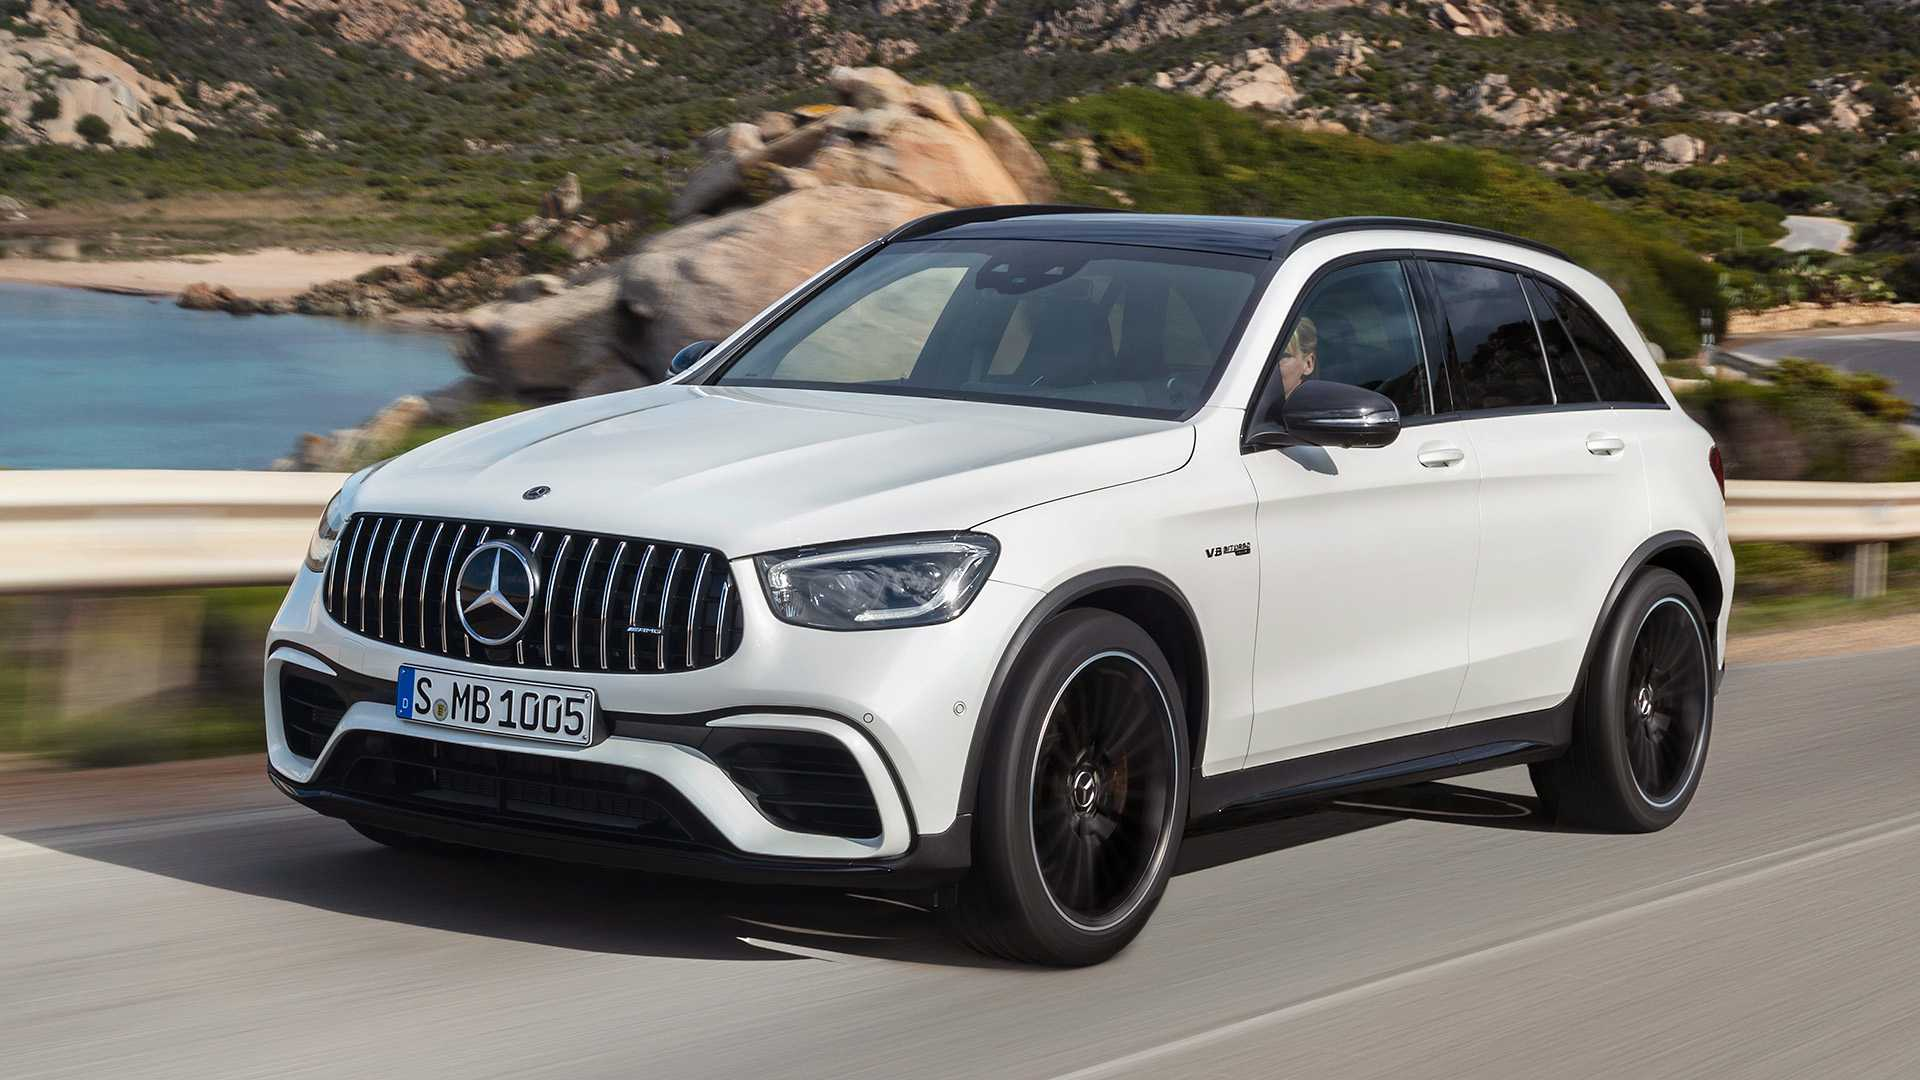 2018 Mercedes-Benz GLC: New AMG GLC63 Models, Price >> Mercedes Announces Sub 75k Price Tag For New Amg Glc 63